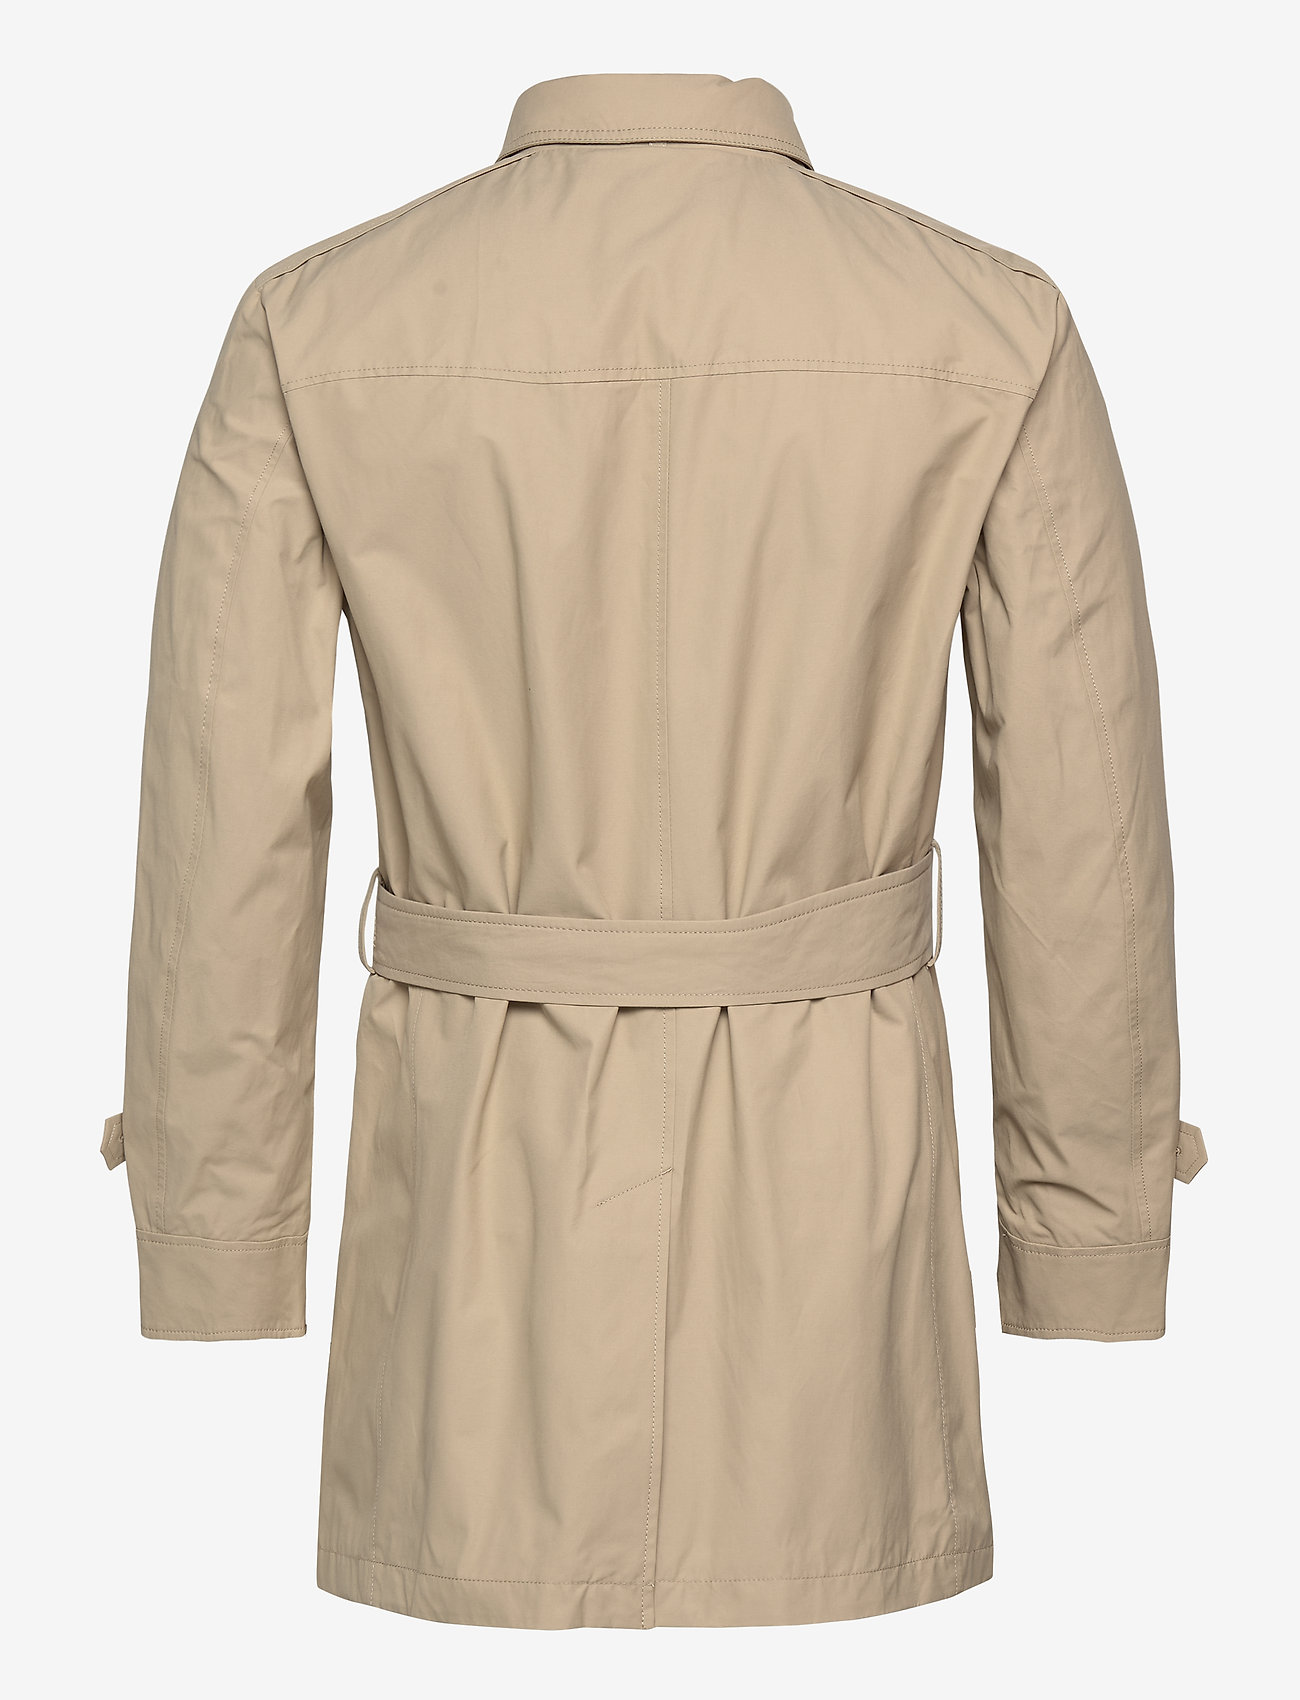 SAND - Techno Cotton - Trench B - trenchcoats - light camel - 1